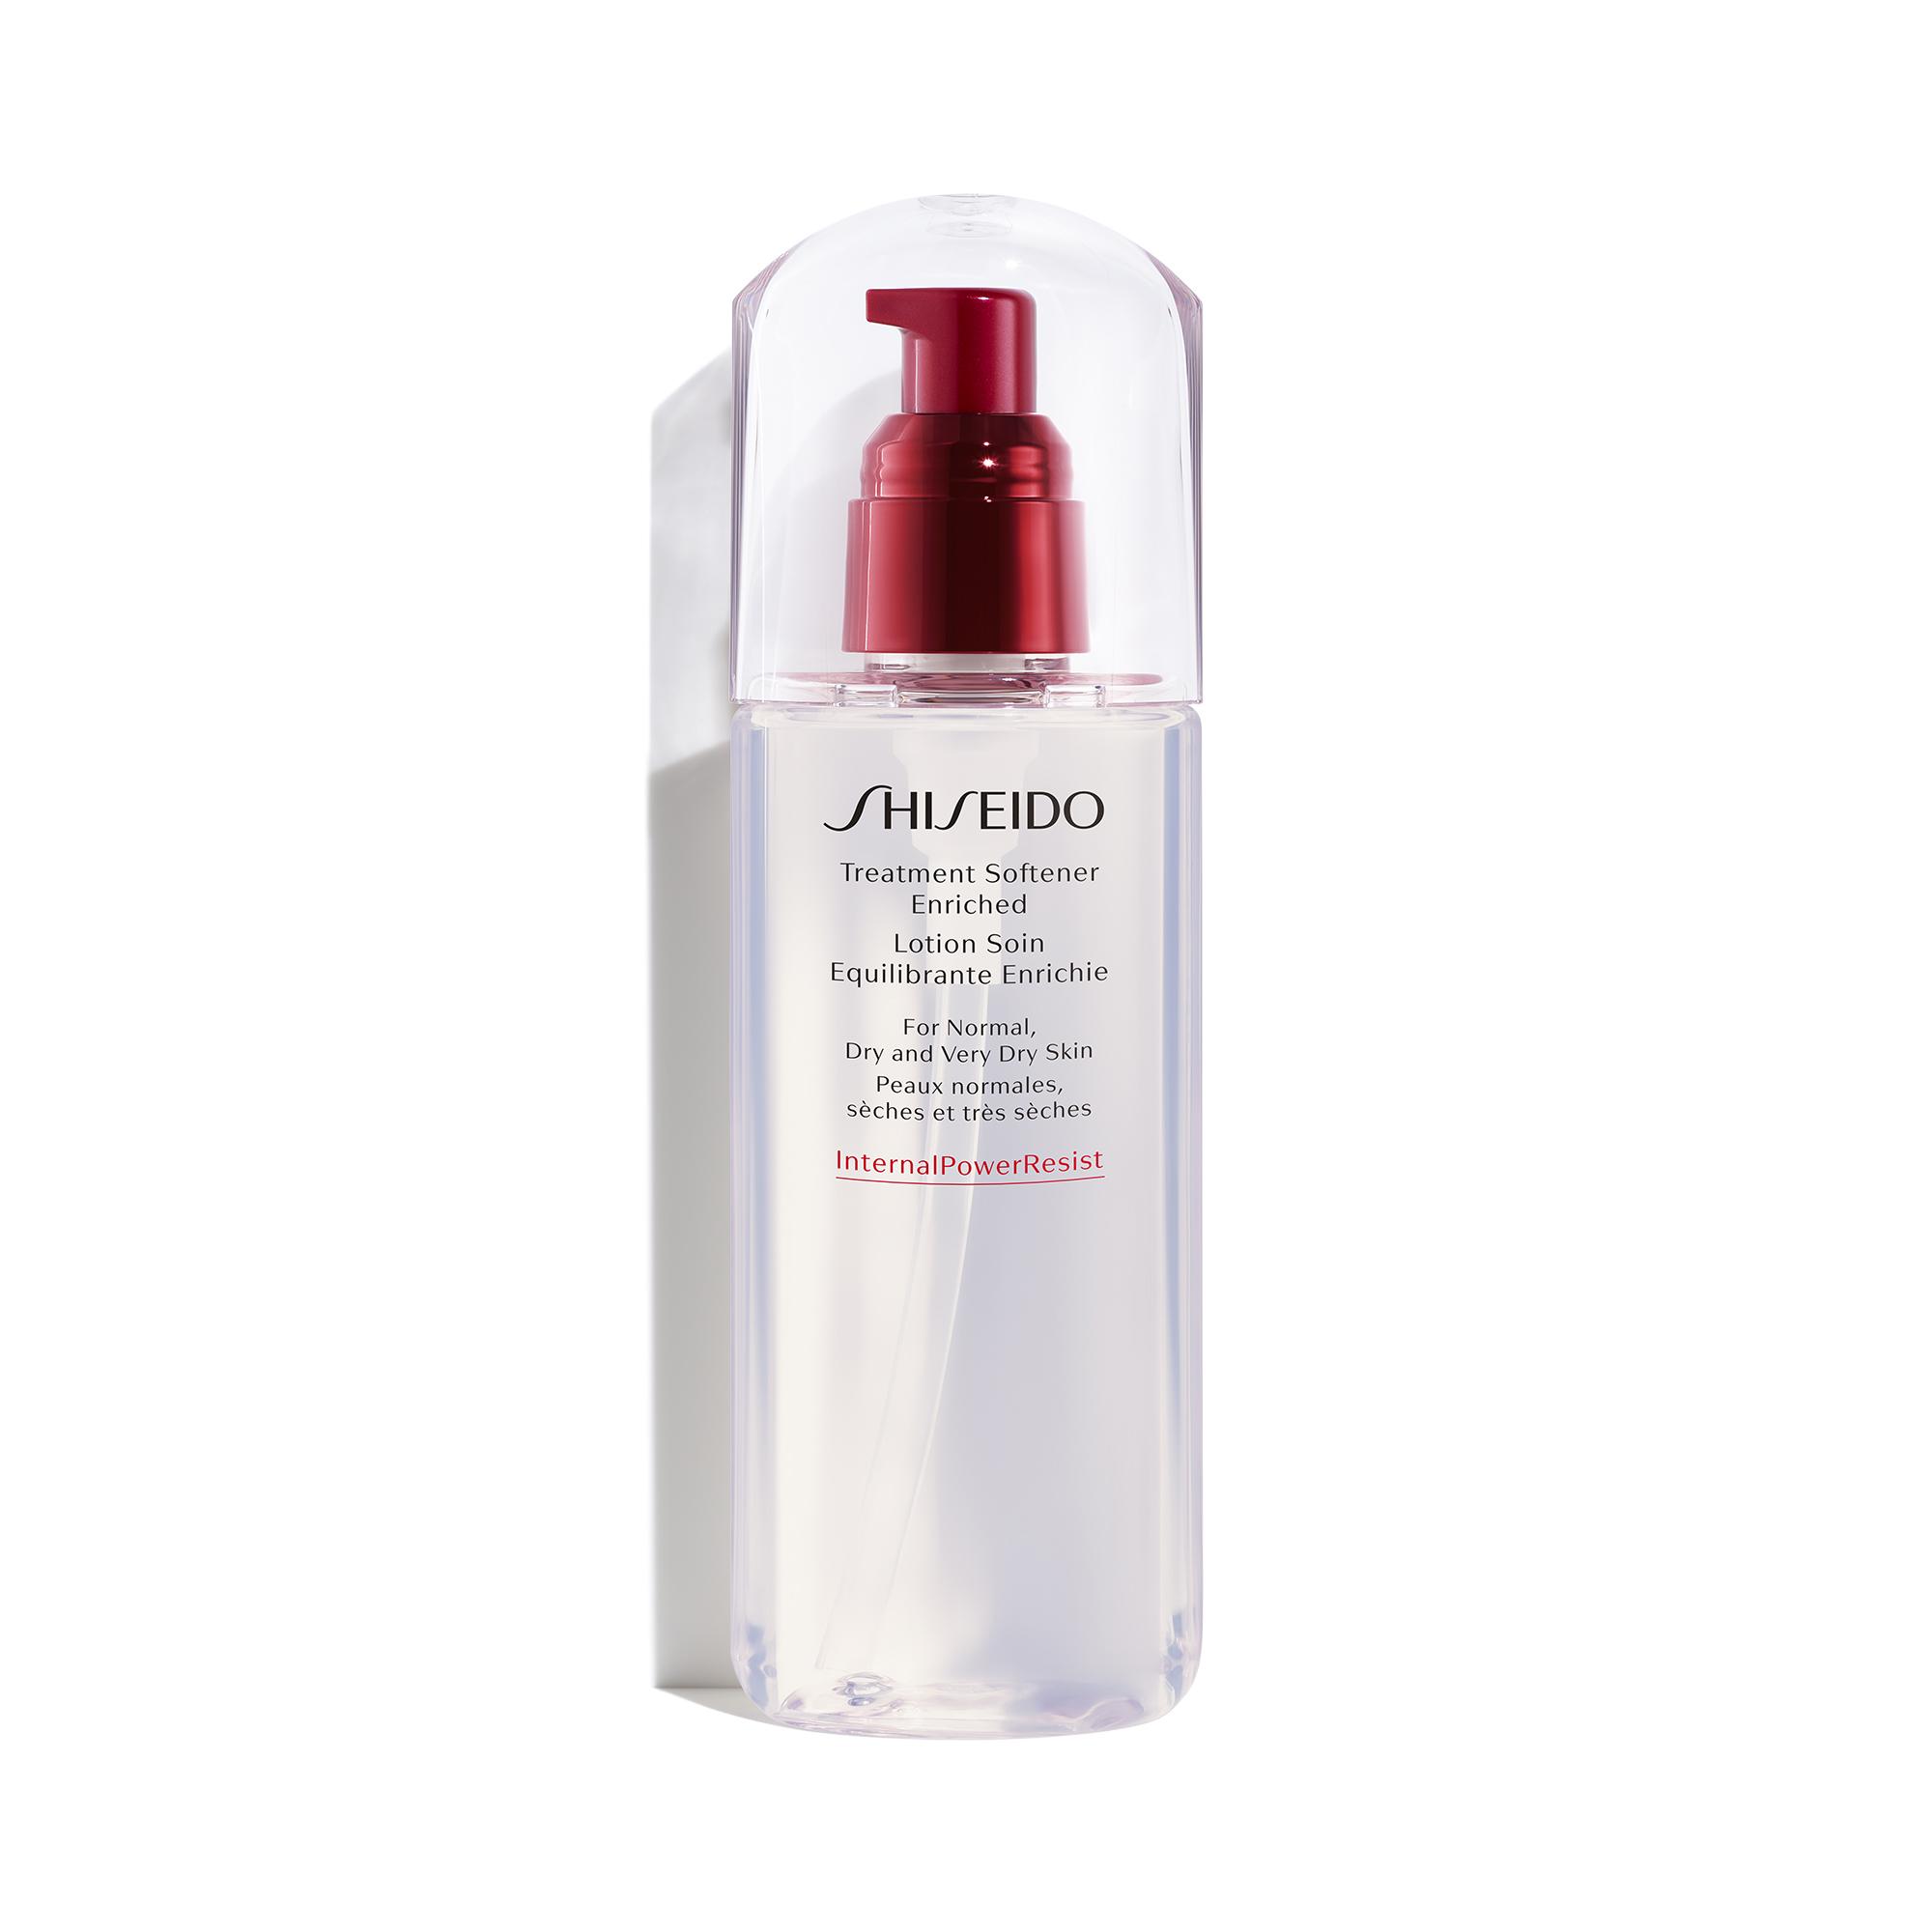 Shiseido Defend Treatment Softener Enriched, 150 ml